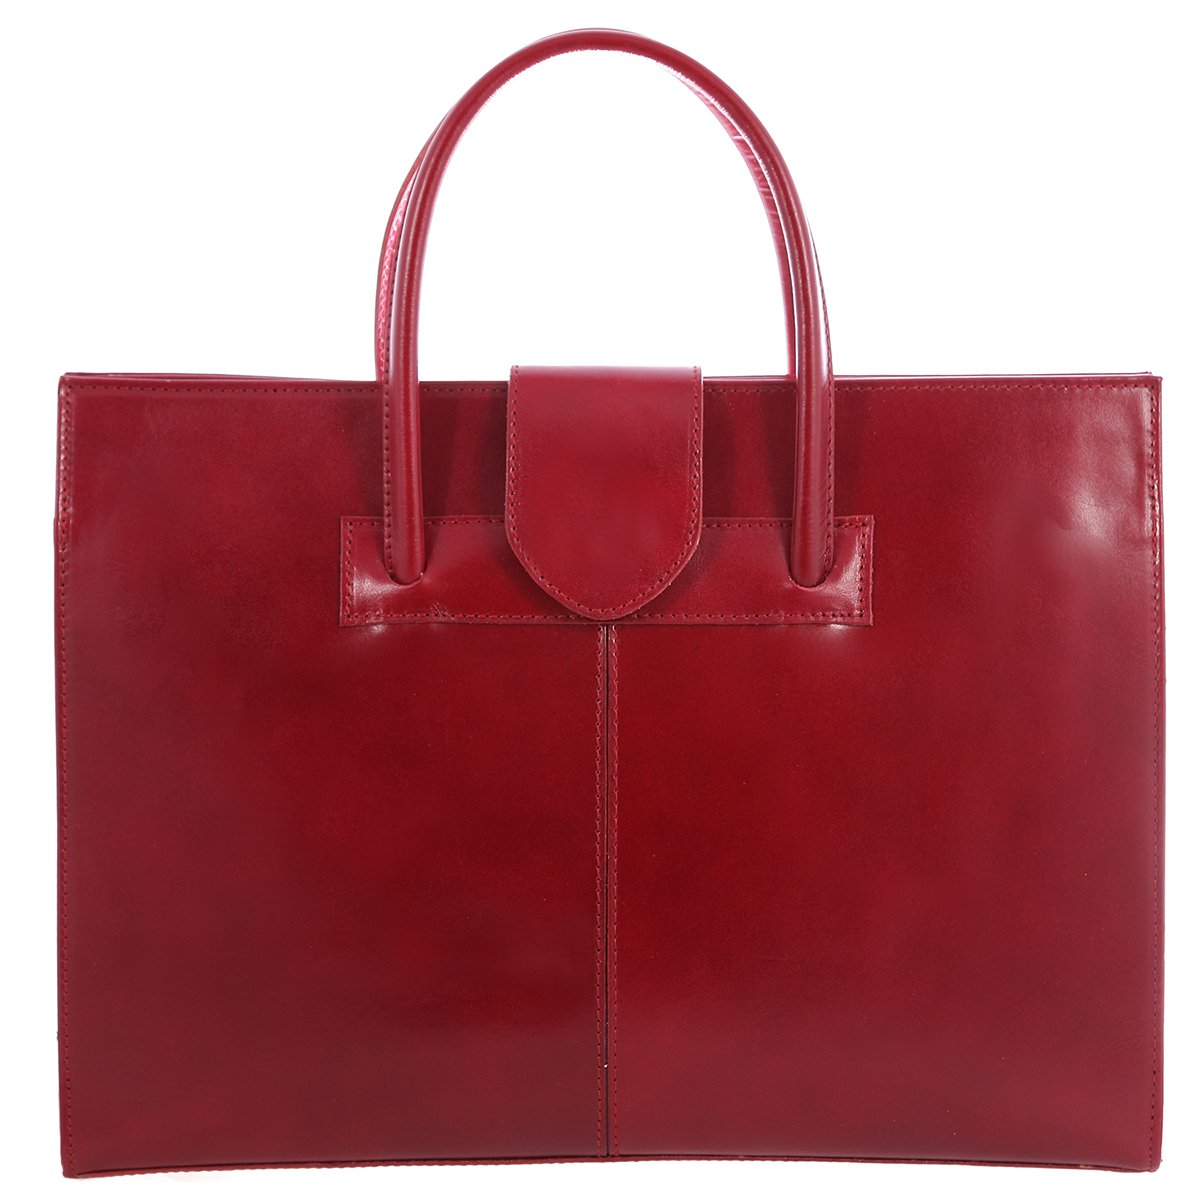 Femme sac sac cartable à l'épaule et portefeuilles main, 100% cuir véritable Made in Italy Chicca Tutto Moda D9025-bluChicca Tutto Moda